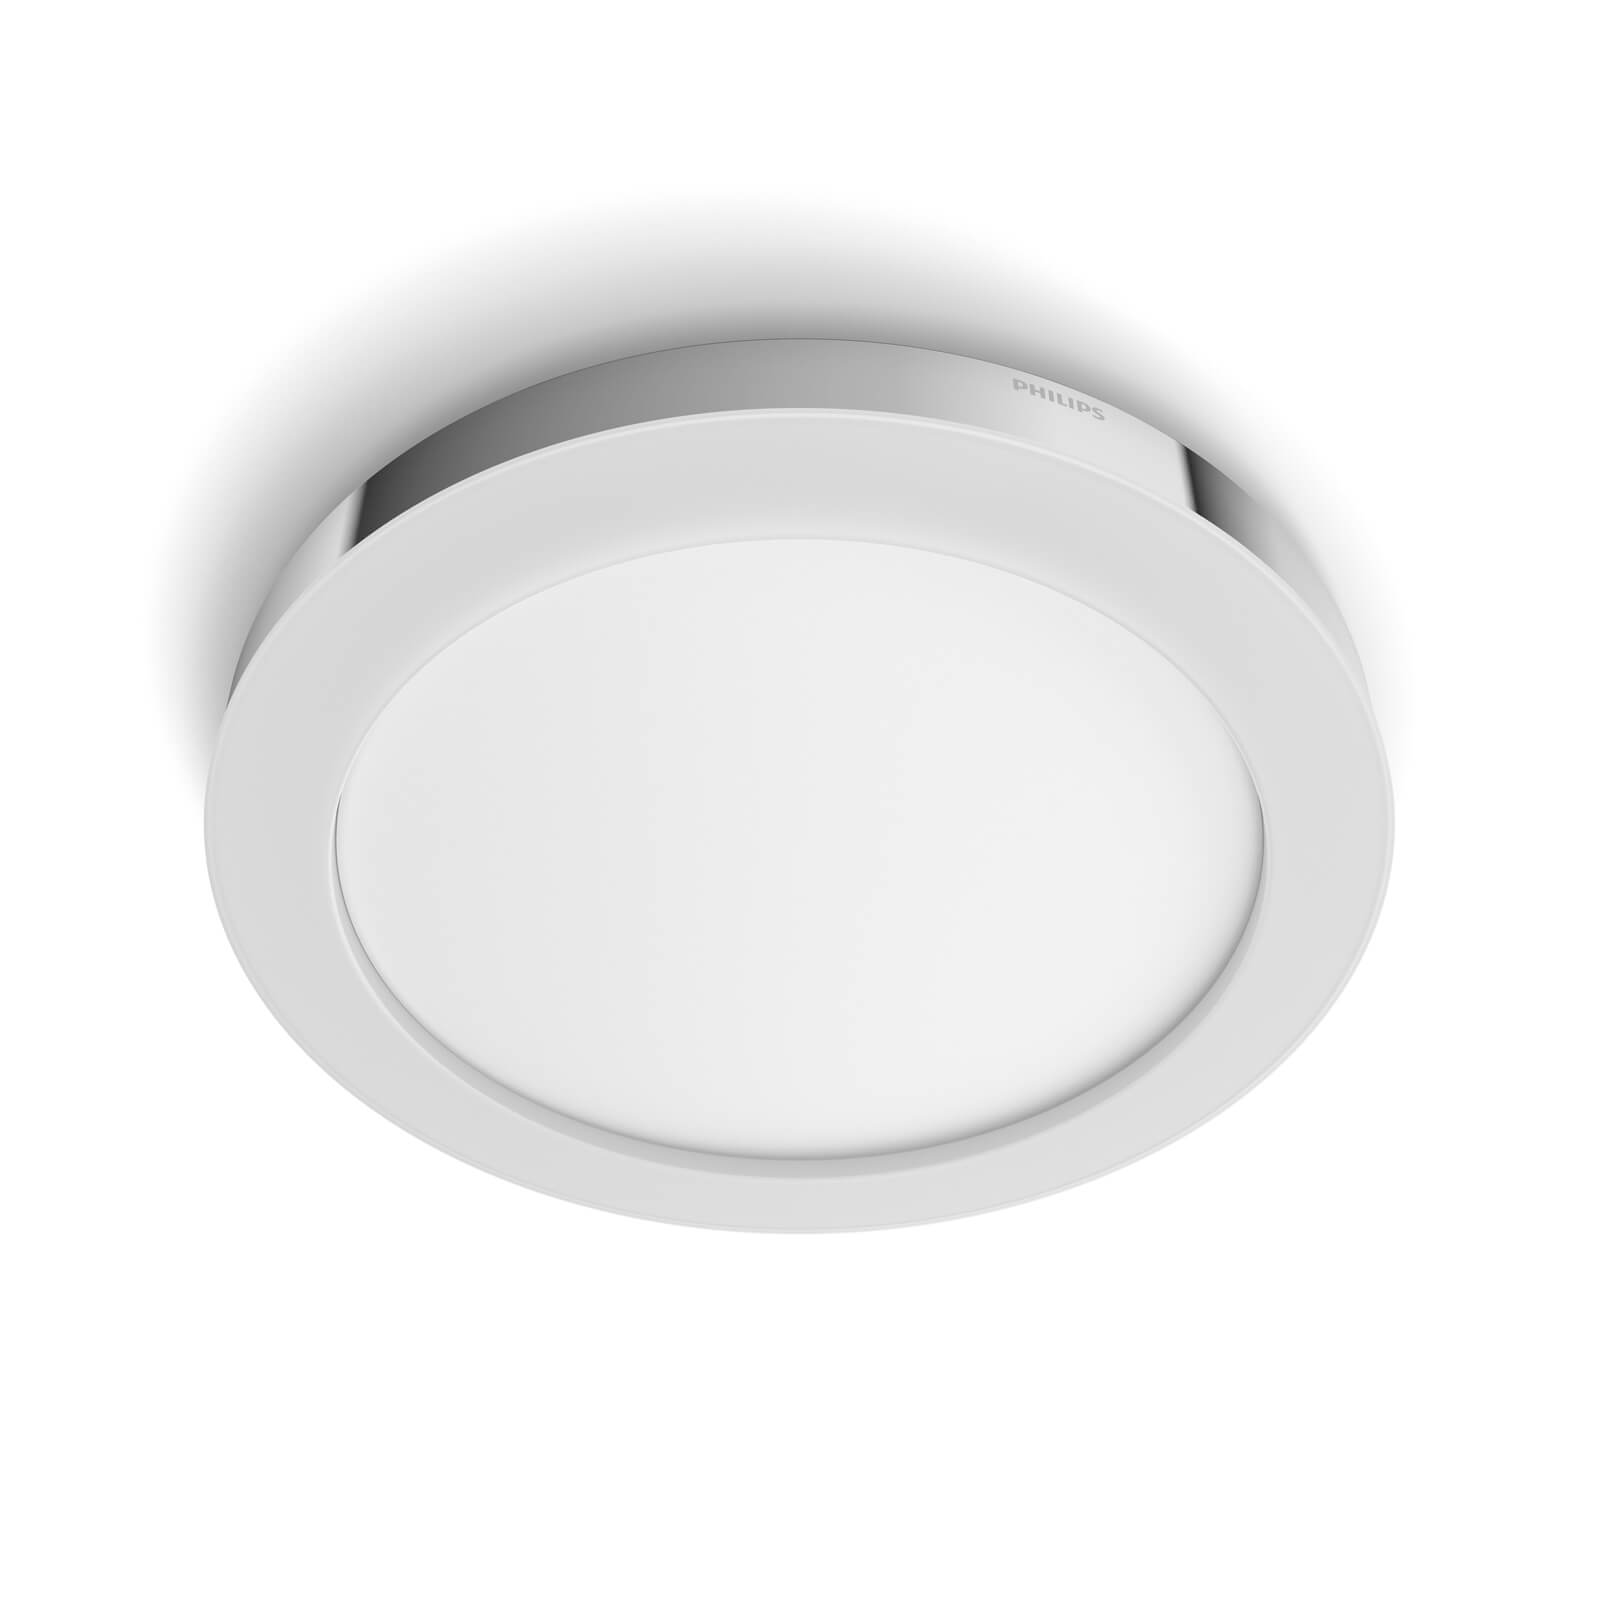 Philips Hue Adore Bathroom Plafondlamp Chroom White Ambiance